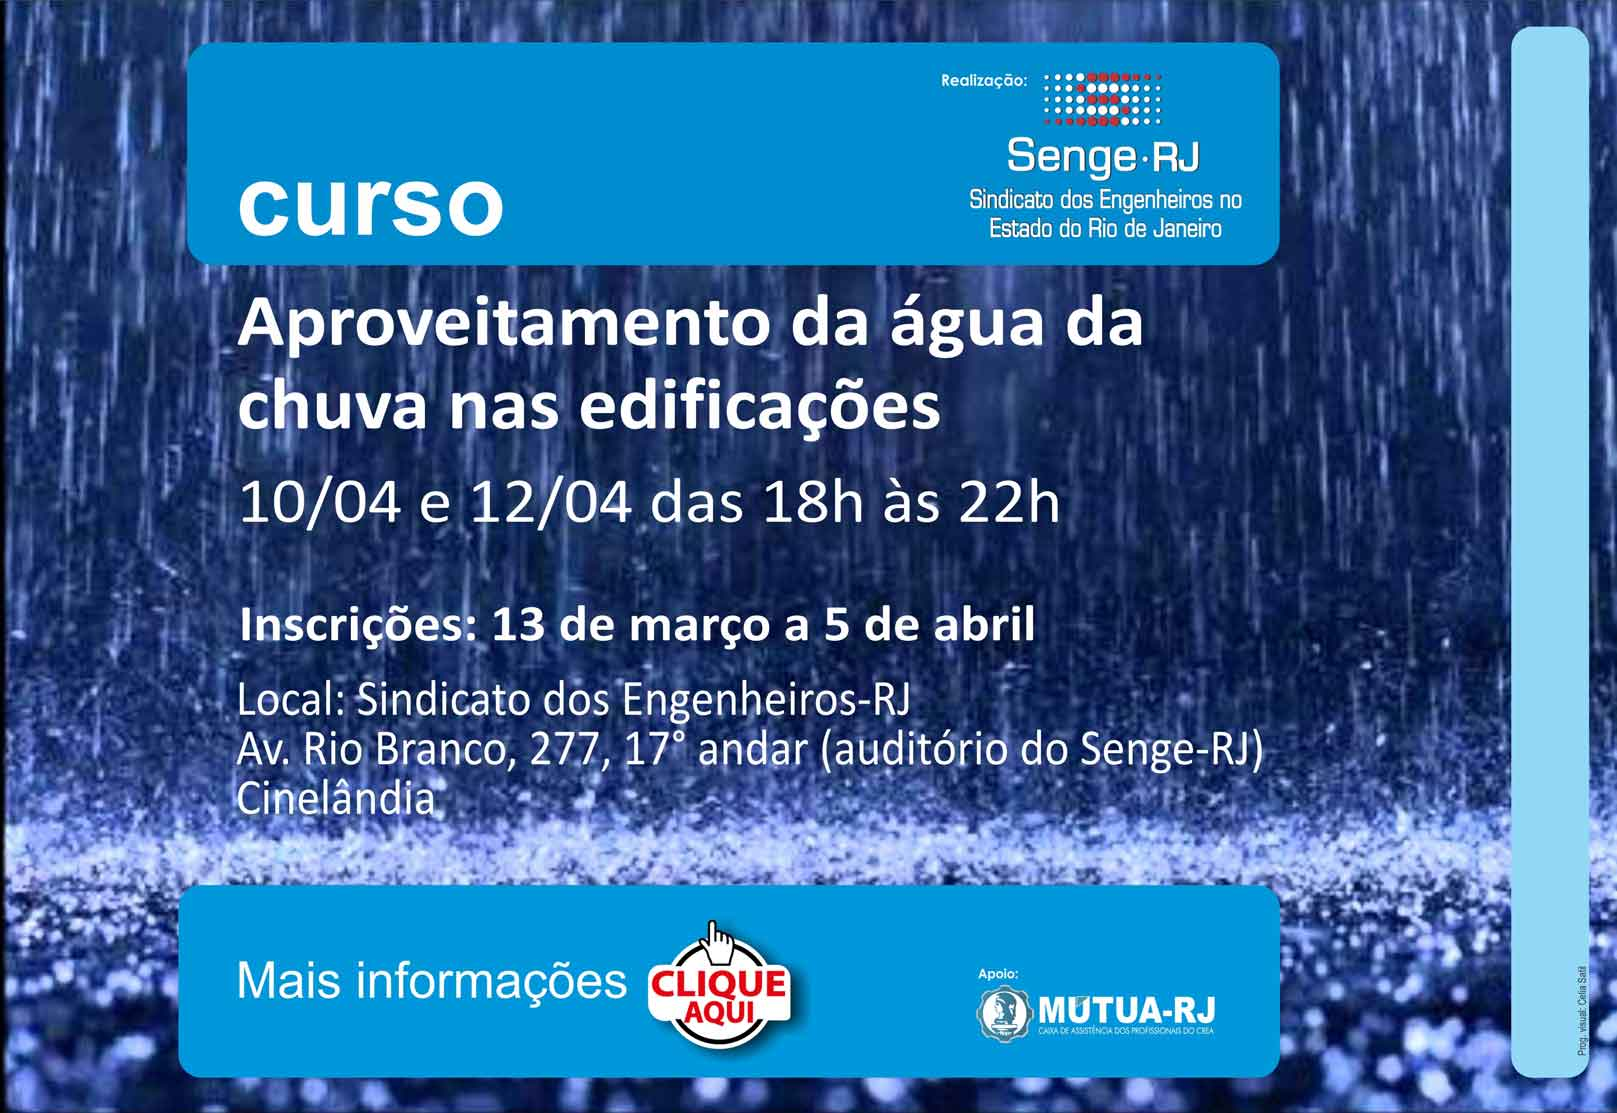 20170118_curso-aproveitamento-das-%c3%a1guas-das-chuvas_10-de-abril-de-2017